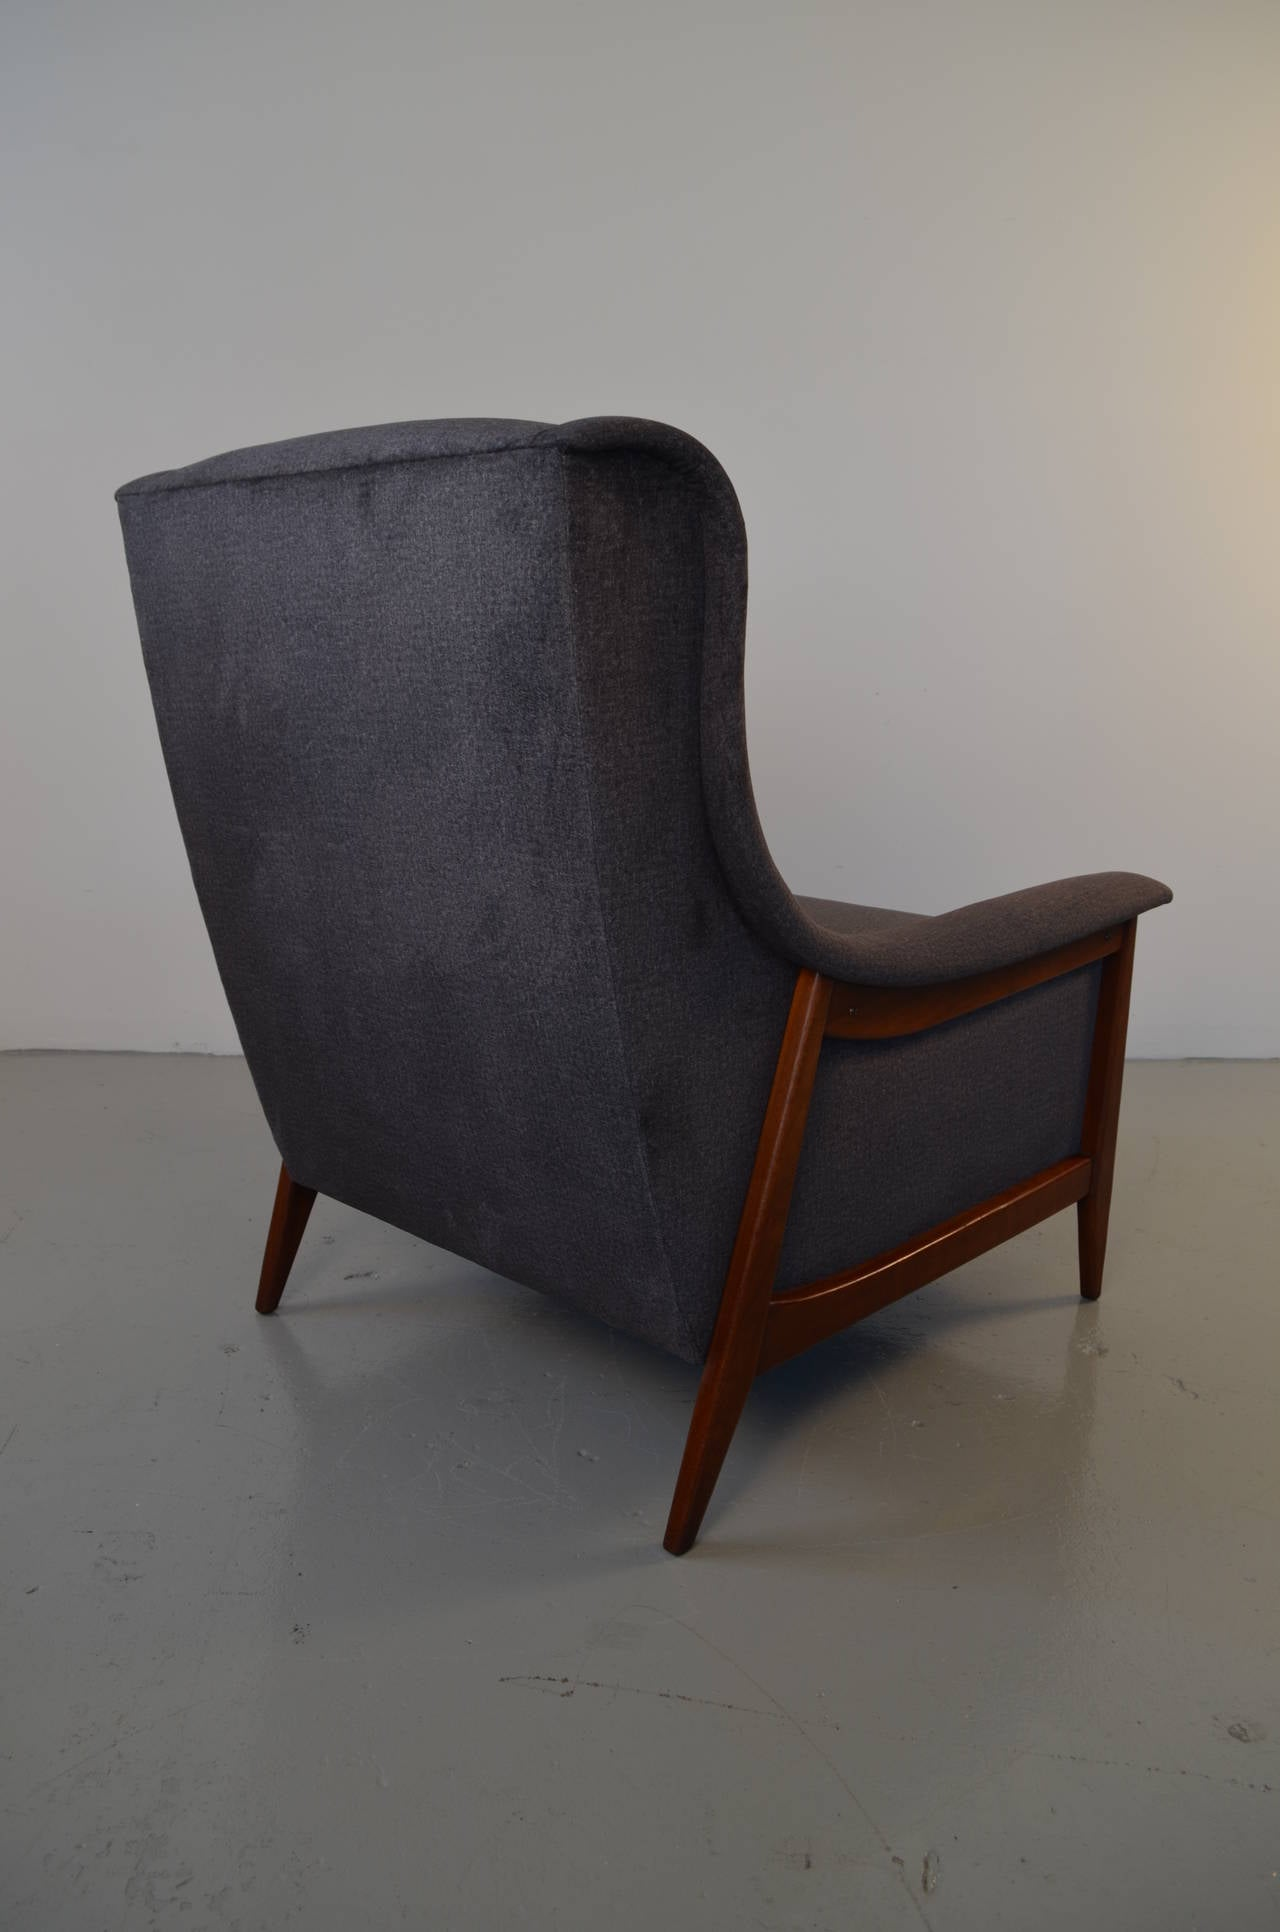 Danish Lounge Chair with Ottoman at 1stdibs